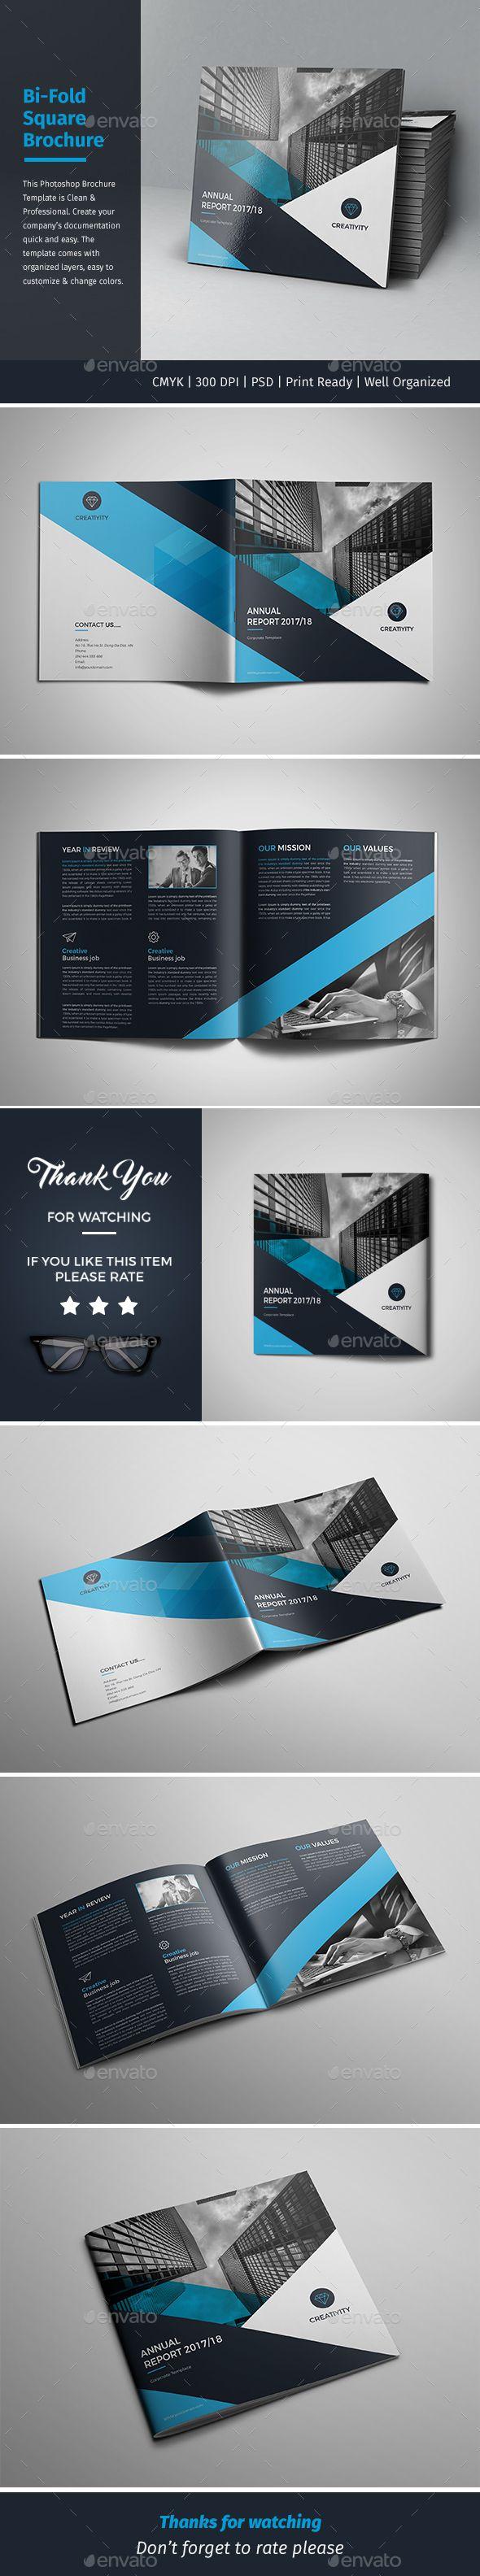 Corporate Bi-fold Square Brochure Template PSD